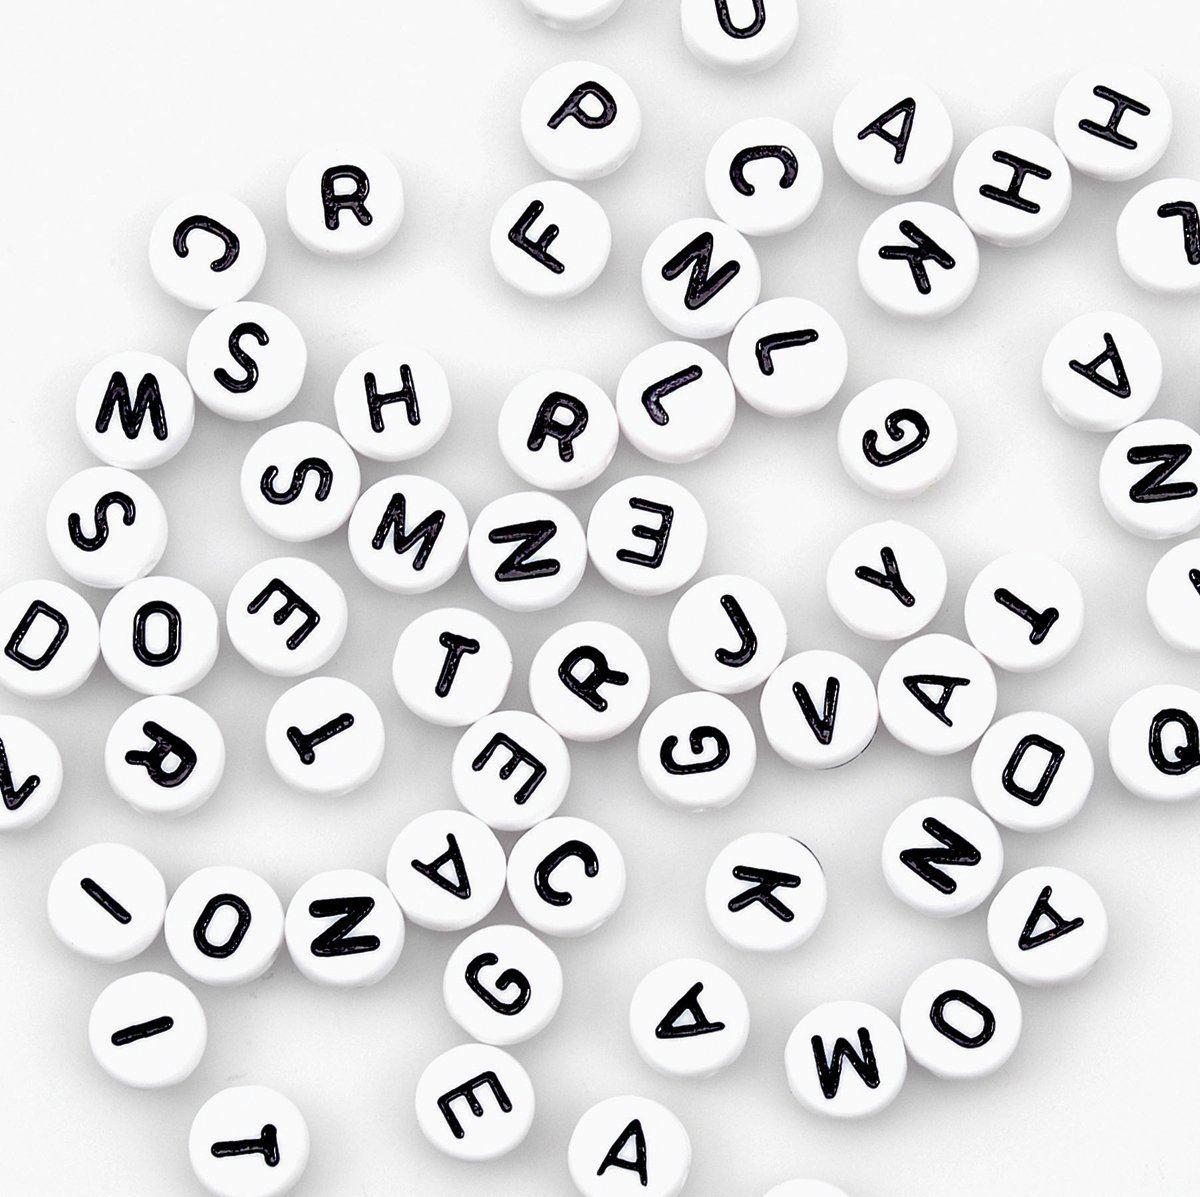 400pcs-Alphabet-Letters-Round-Beads-6-5mm-Acrylic-jewellery-Making-Art-amp-Craft thumbnail 13